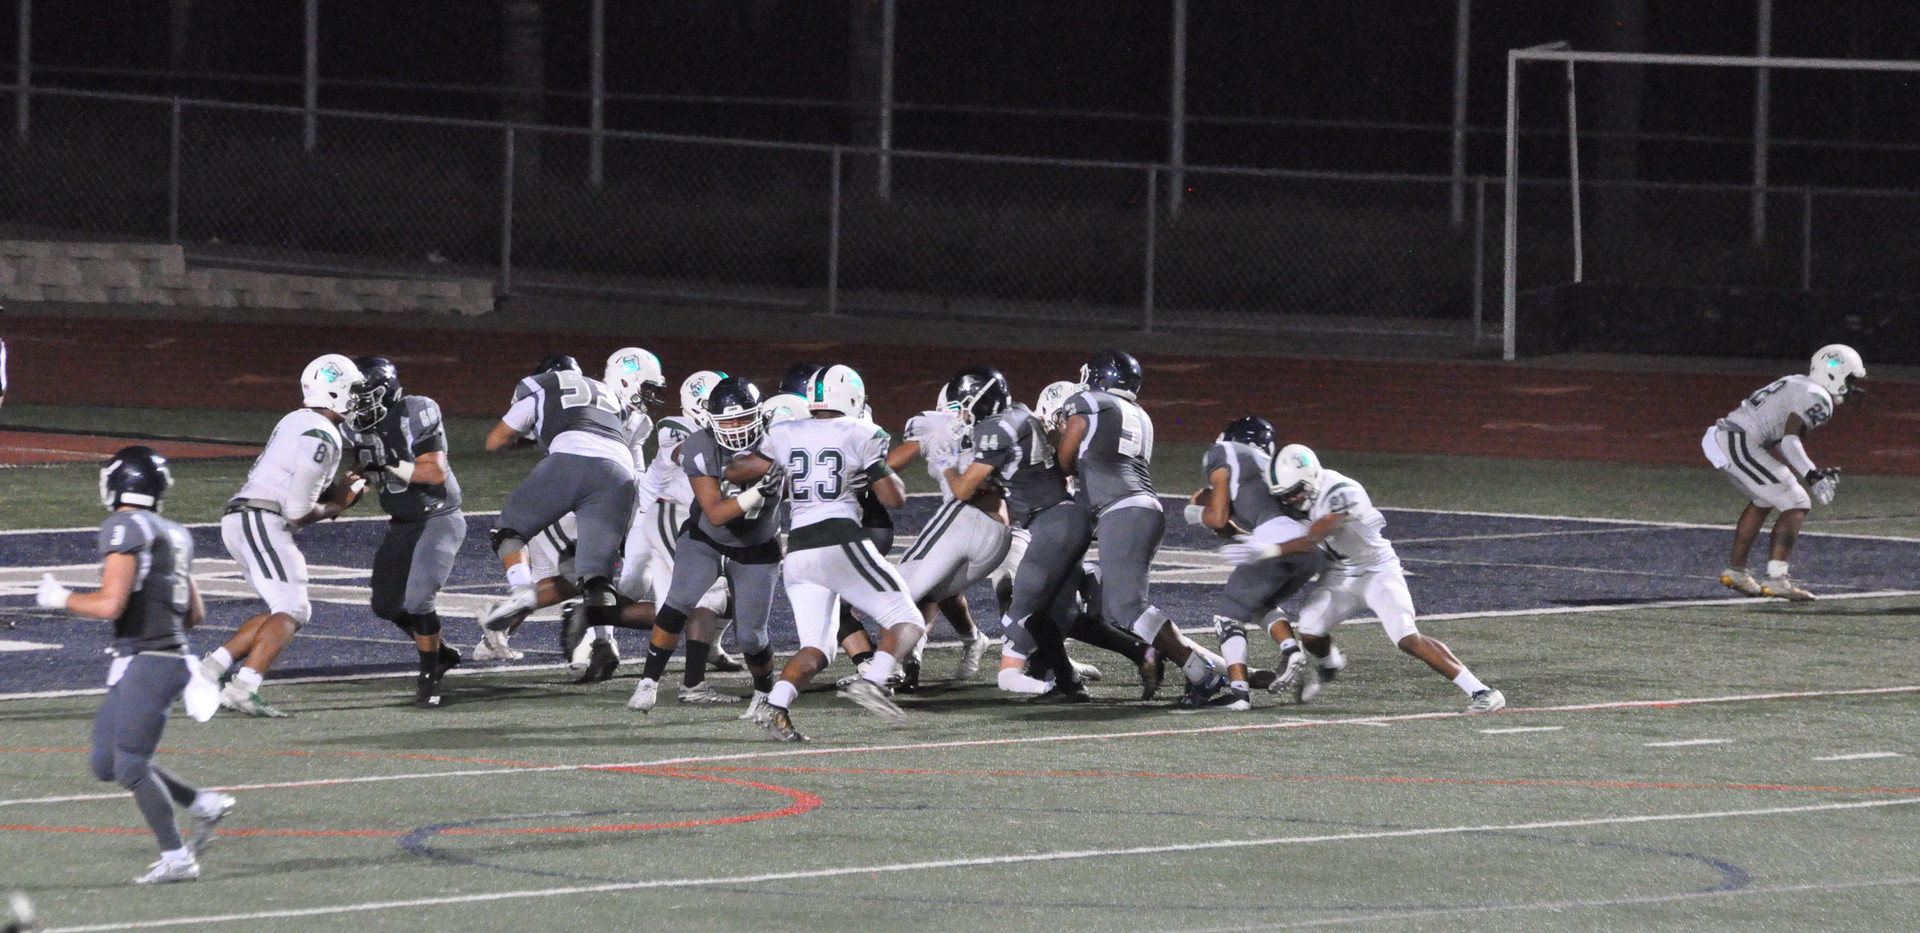 emmett tackle near endzone.JPG